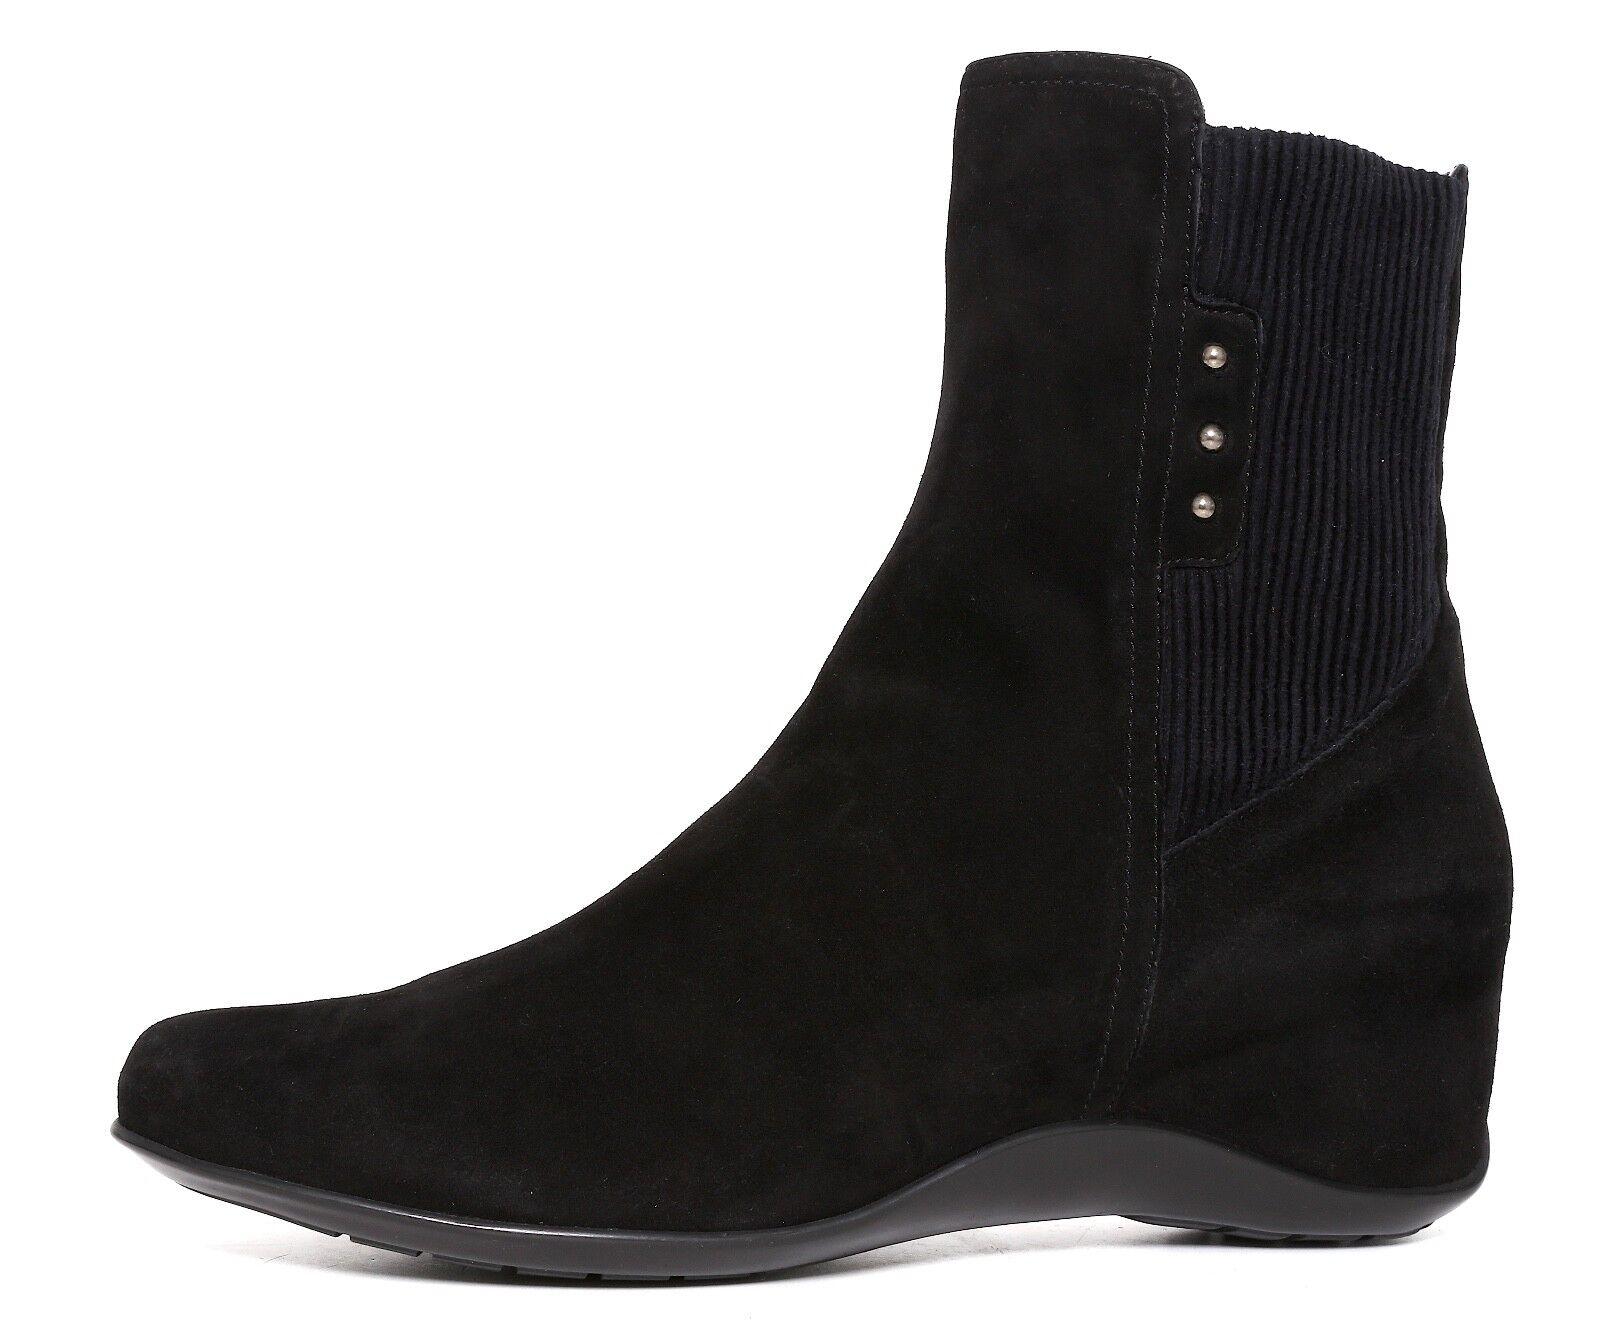 Aquatalia Versus Suede Wedge Ankle Boot Black Women Sz 9.5 6650 *